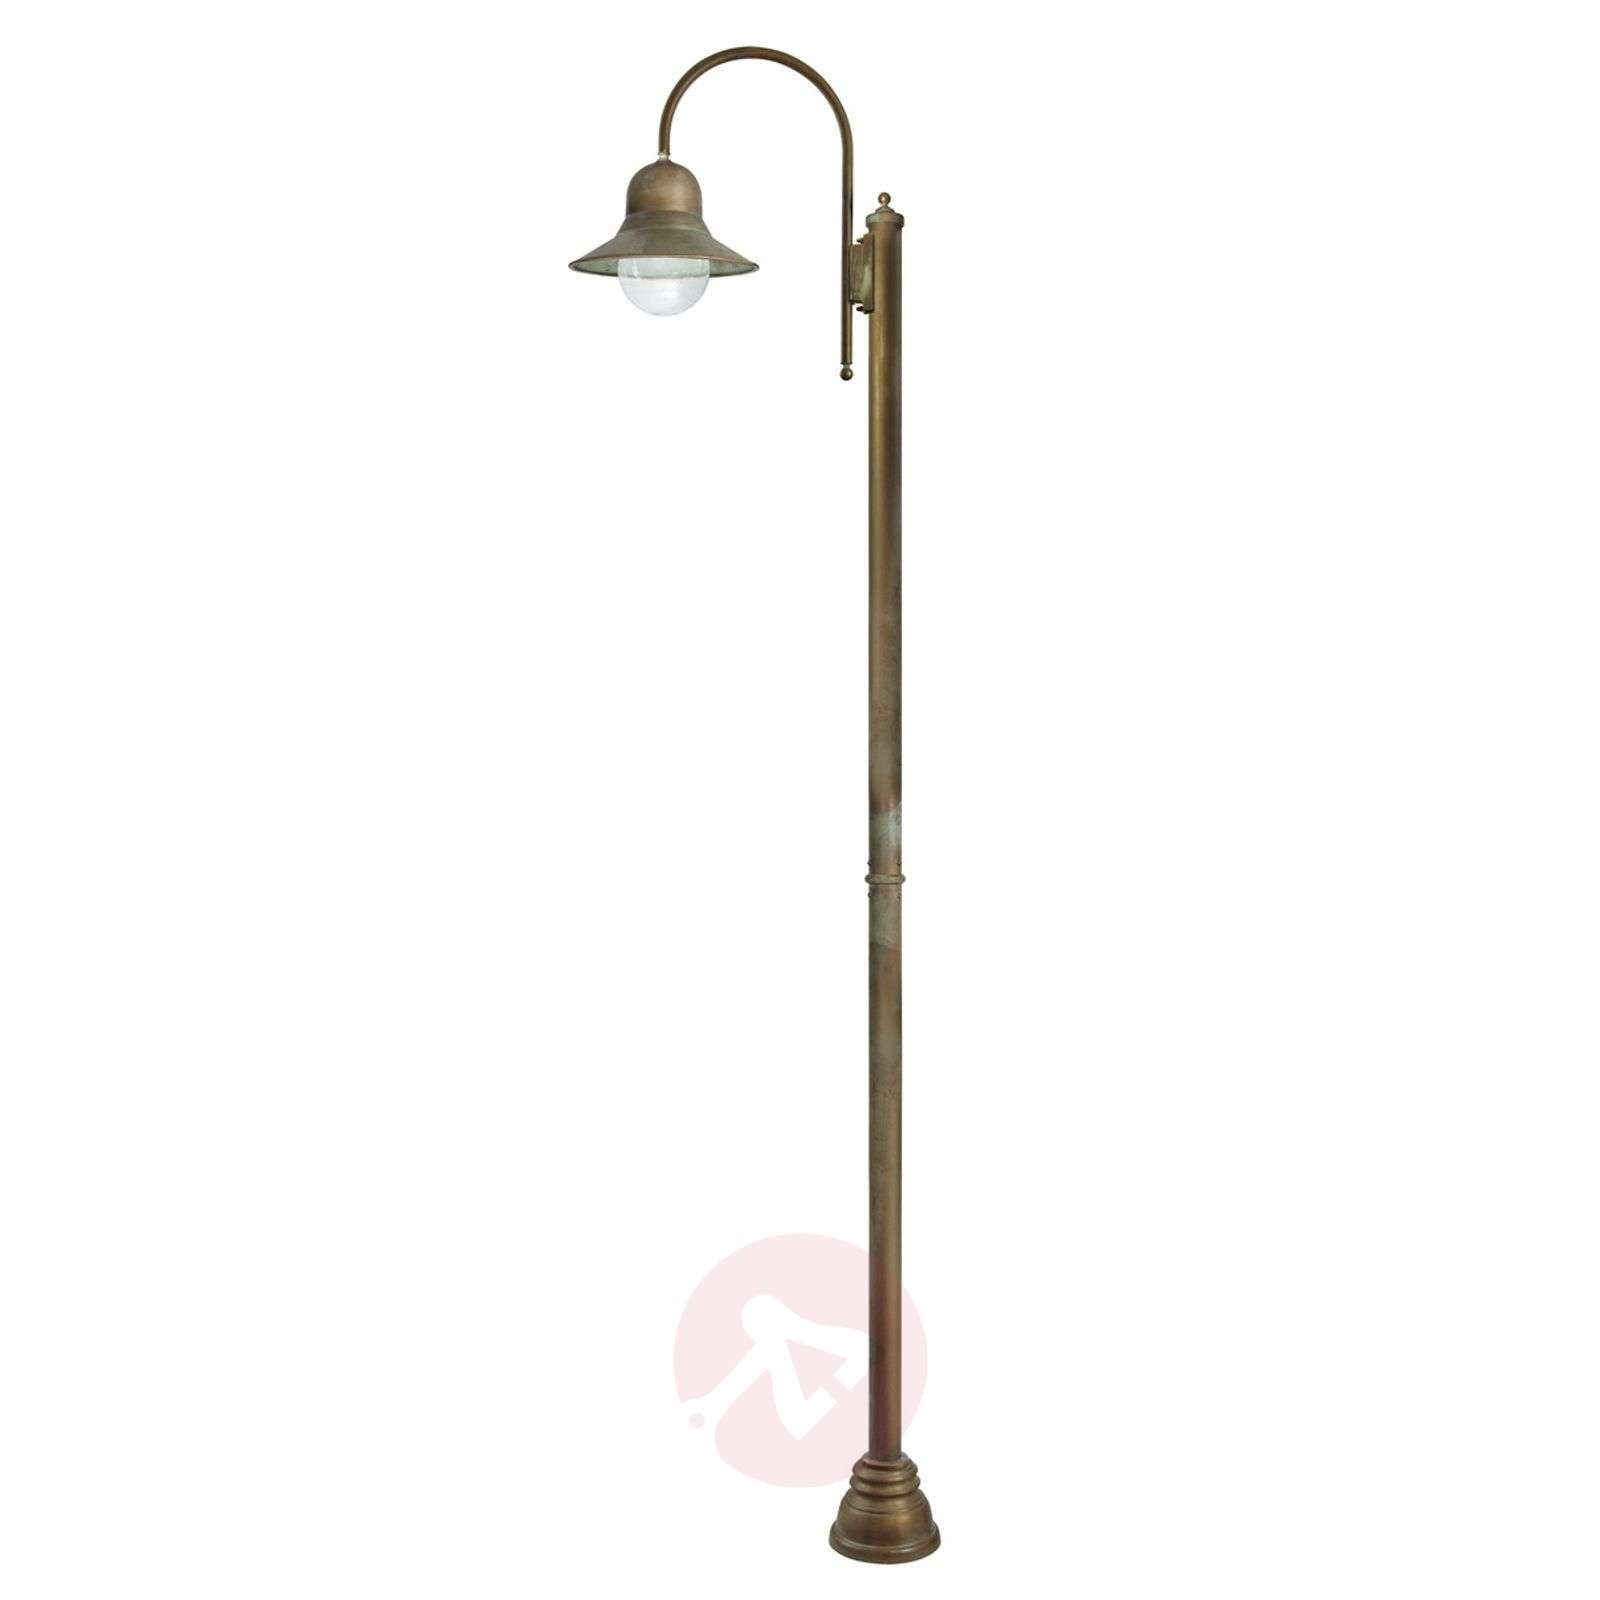 270 cm tall post light Felizia in antique brass-6515296-01